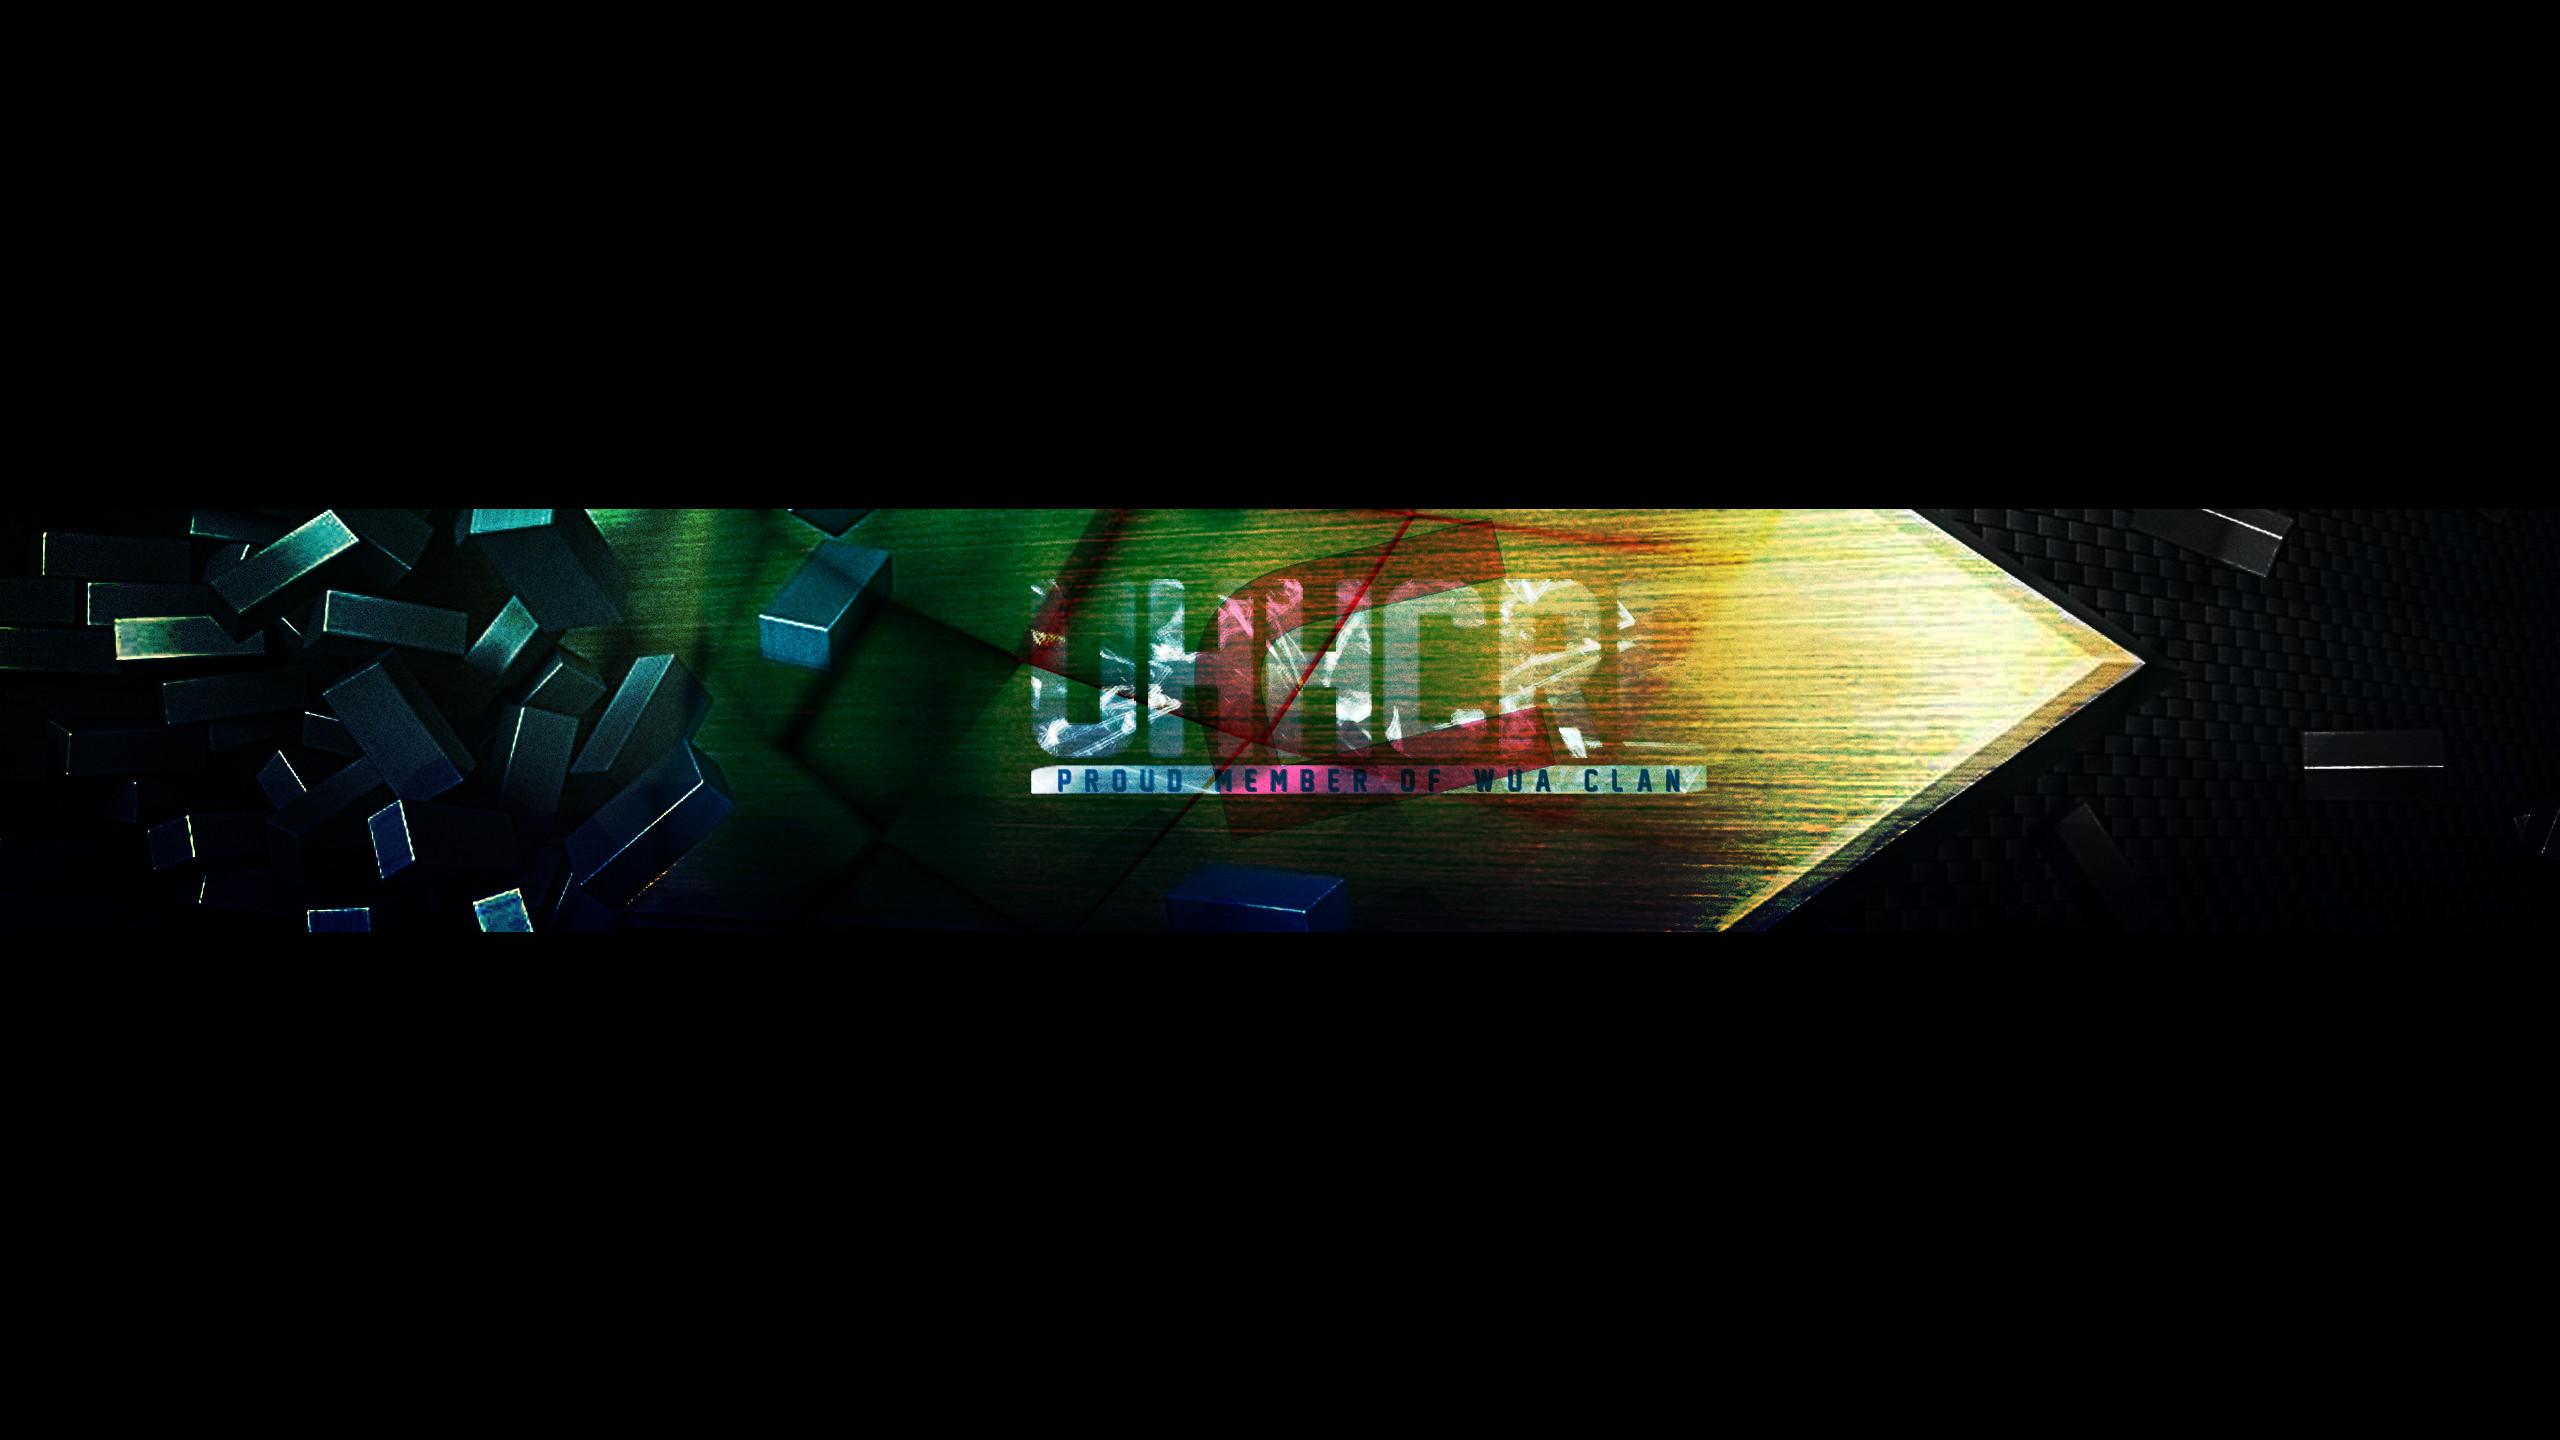 … YouTube Banner #4 UhhCre by Nitrousity